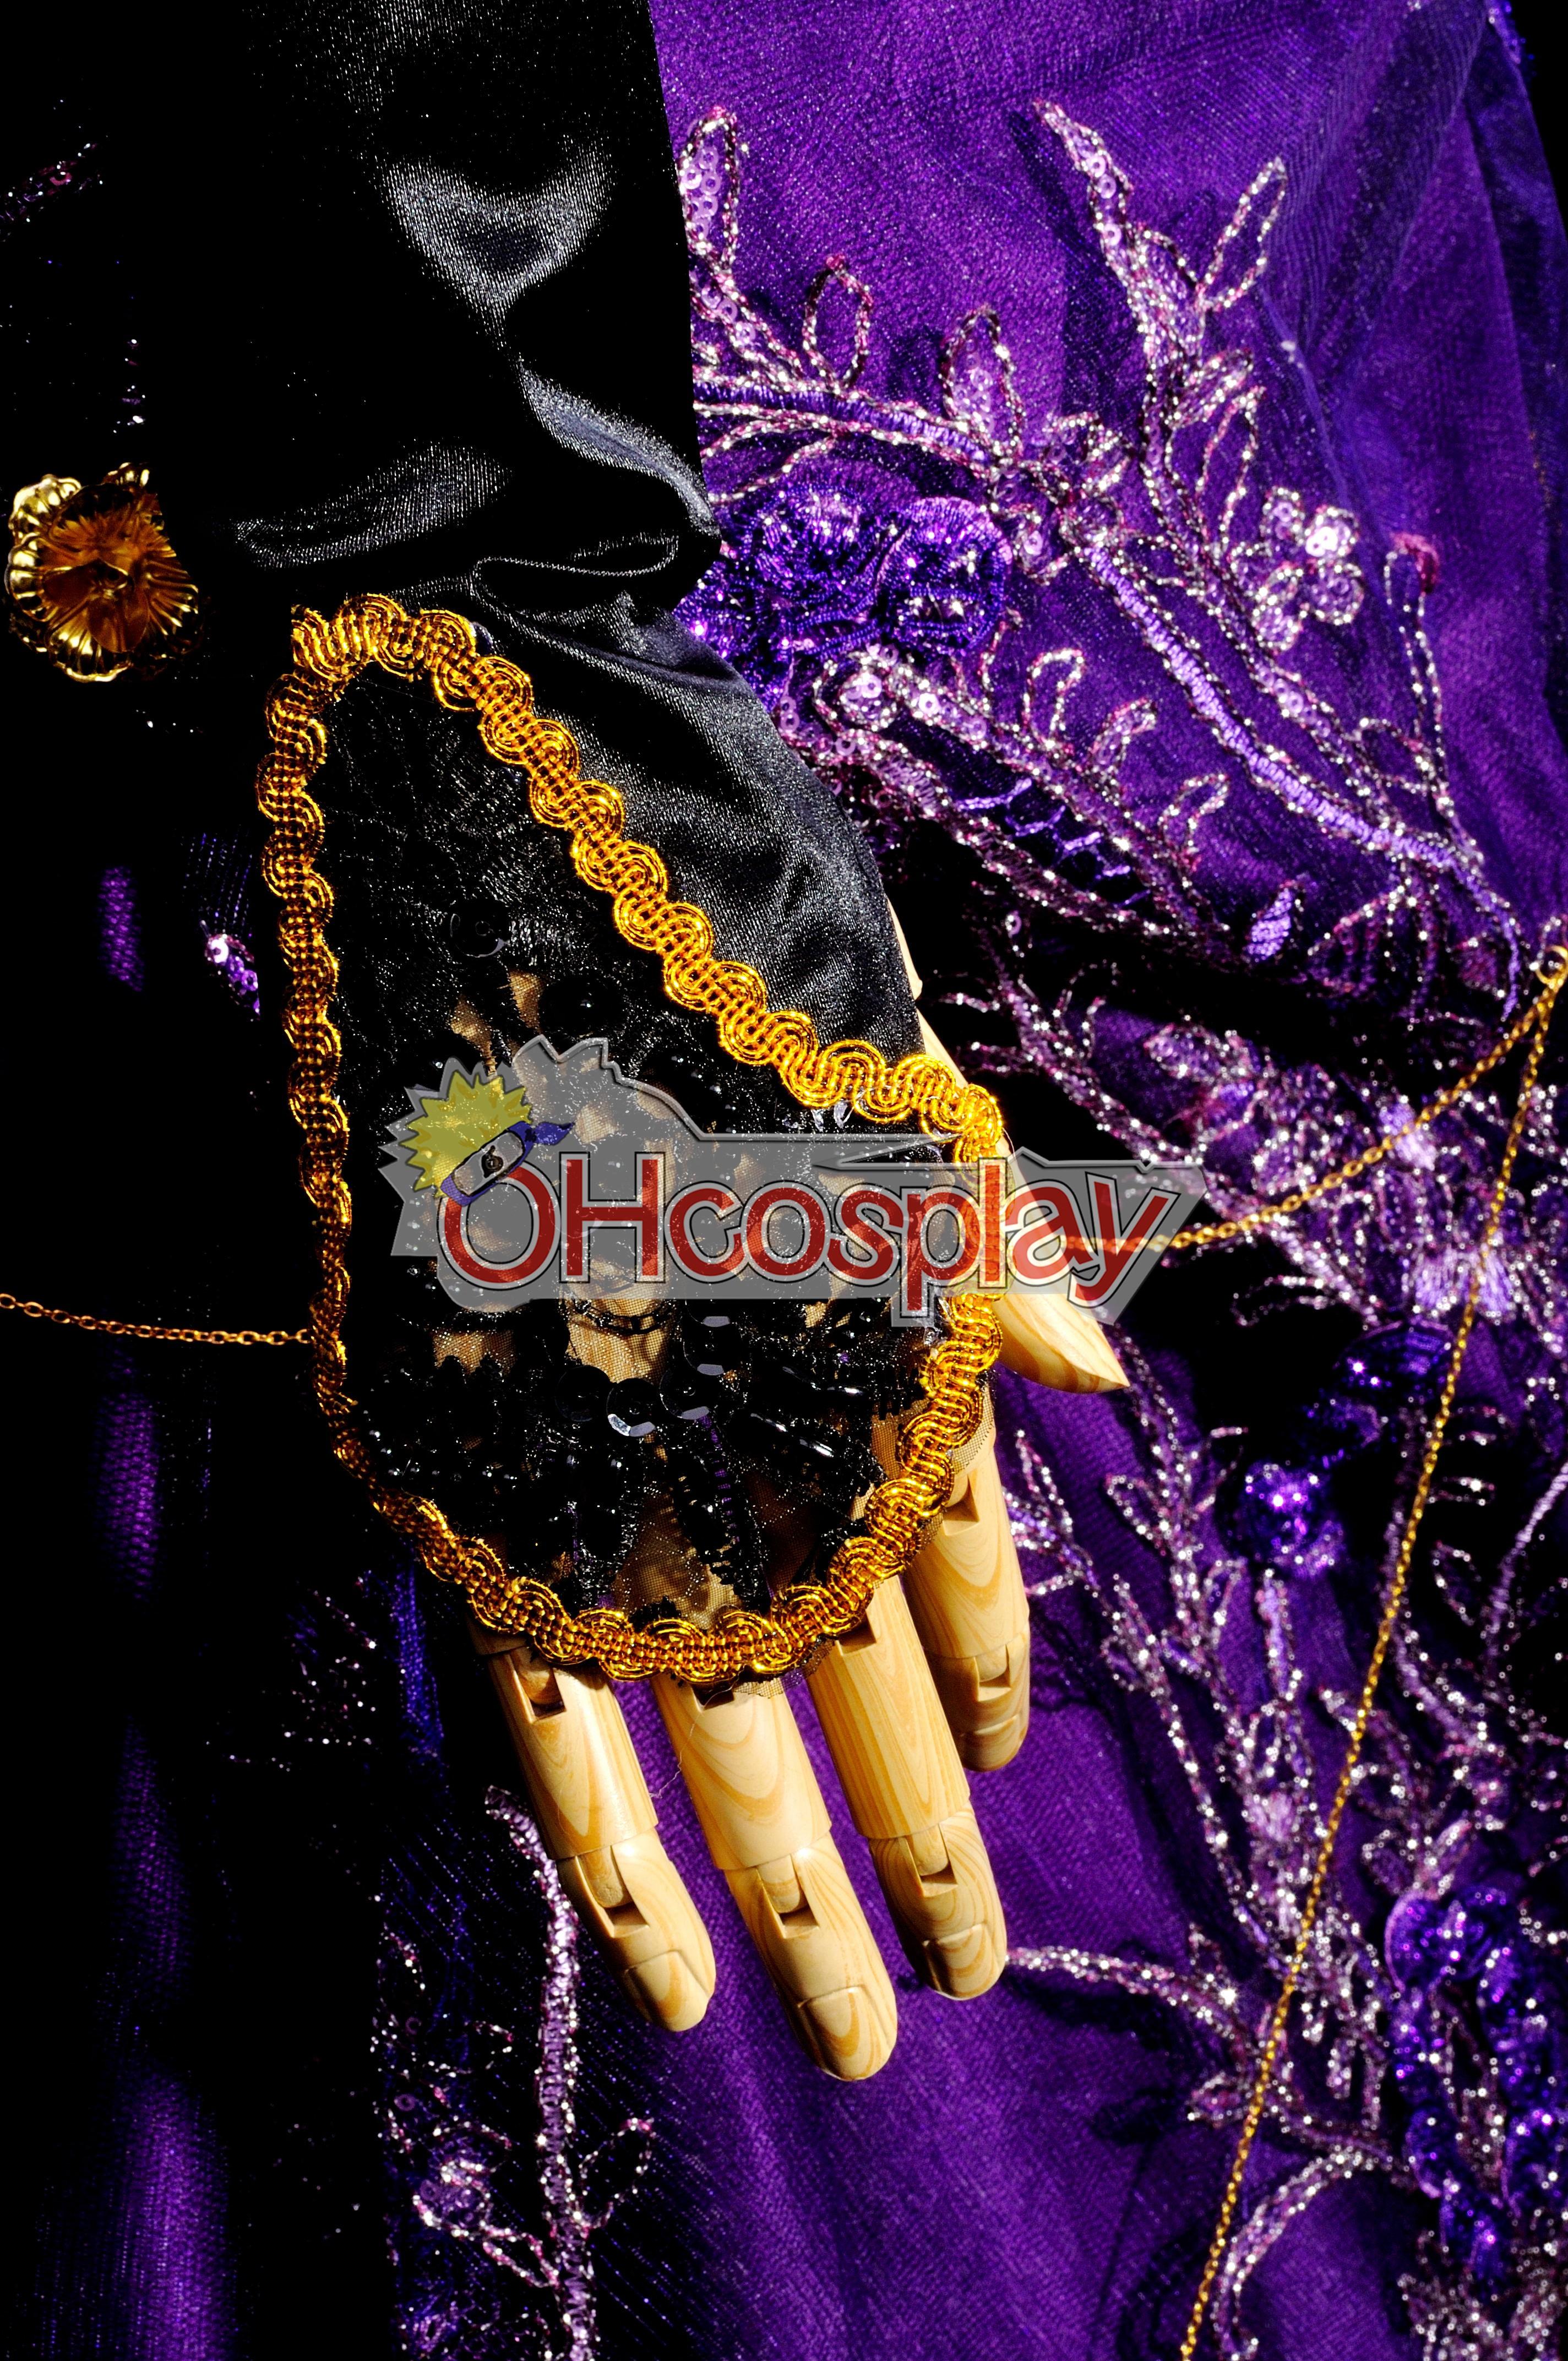 Vocaloid Megurine Luka Sandplay Singing Of The Dragon Cosplay носия